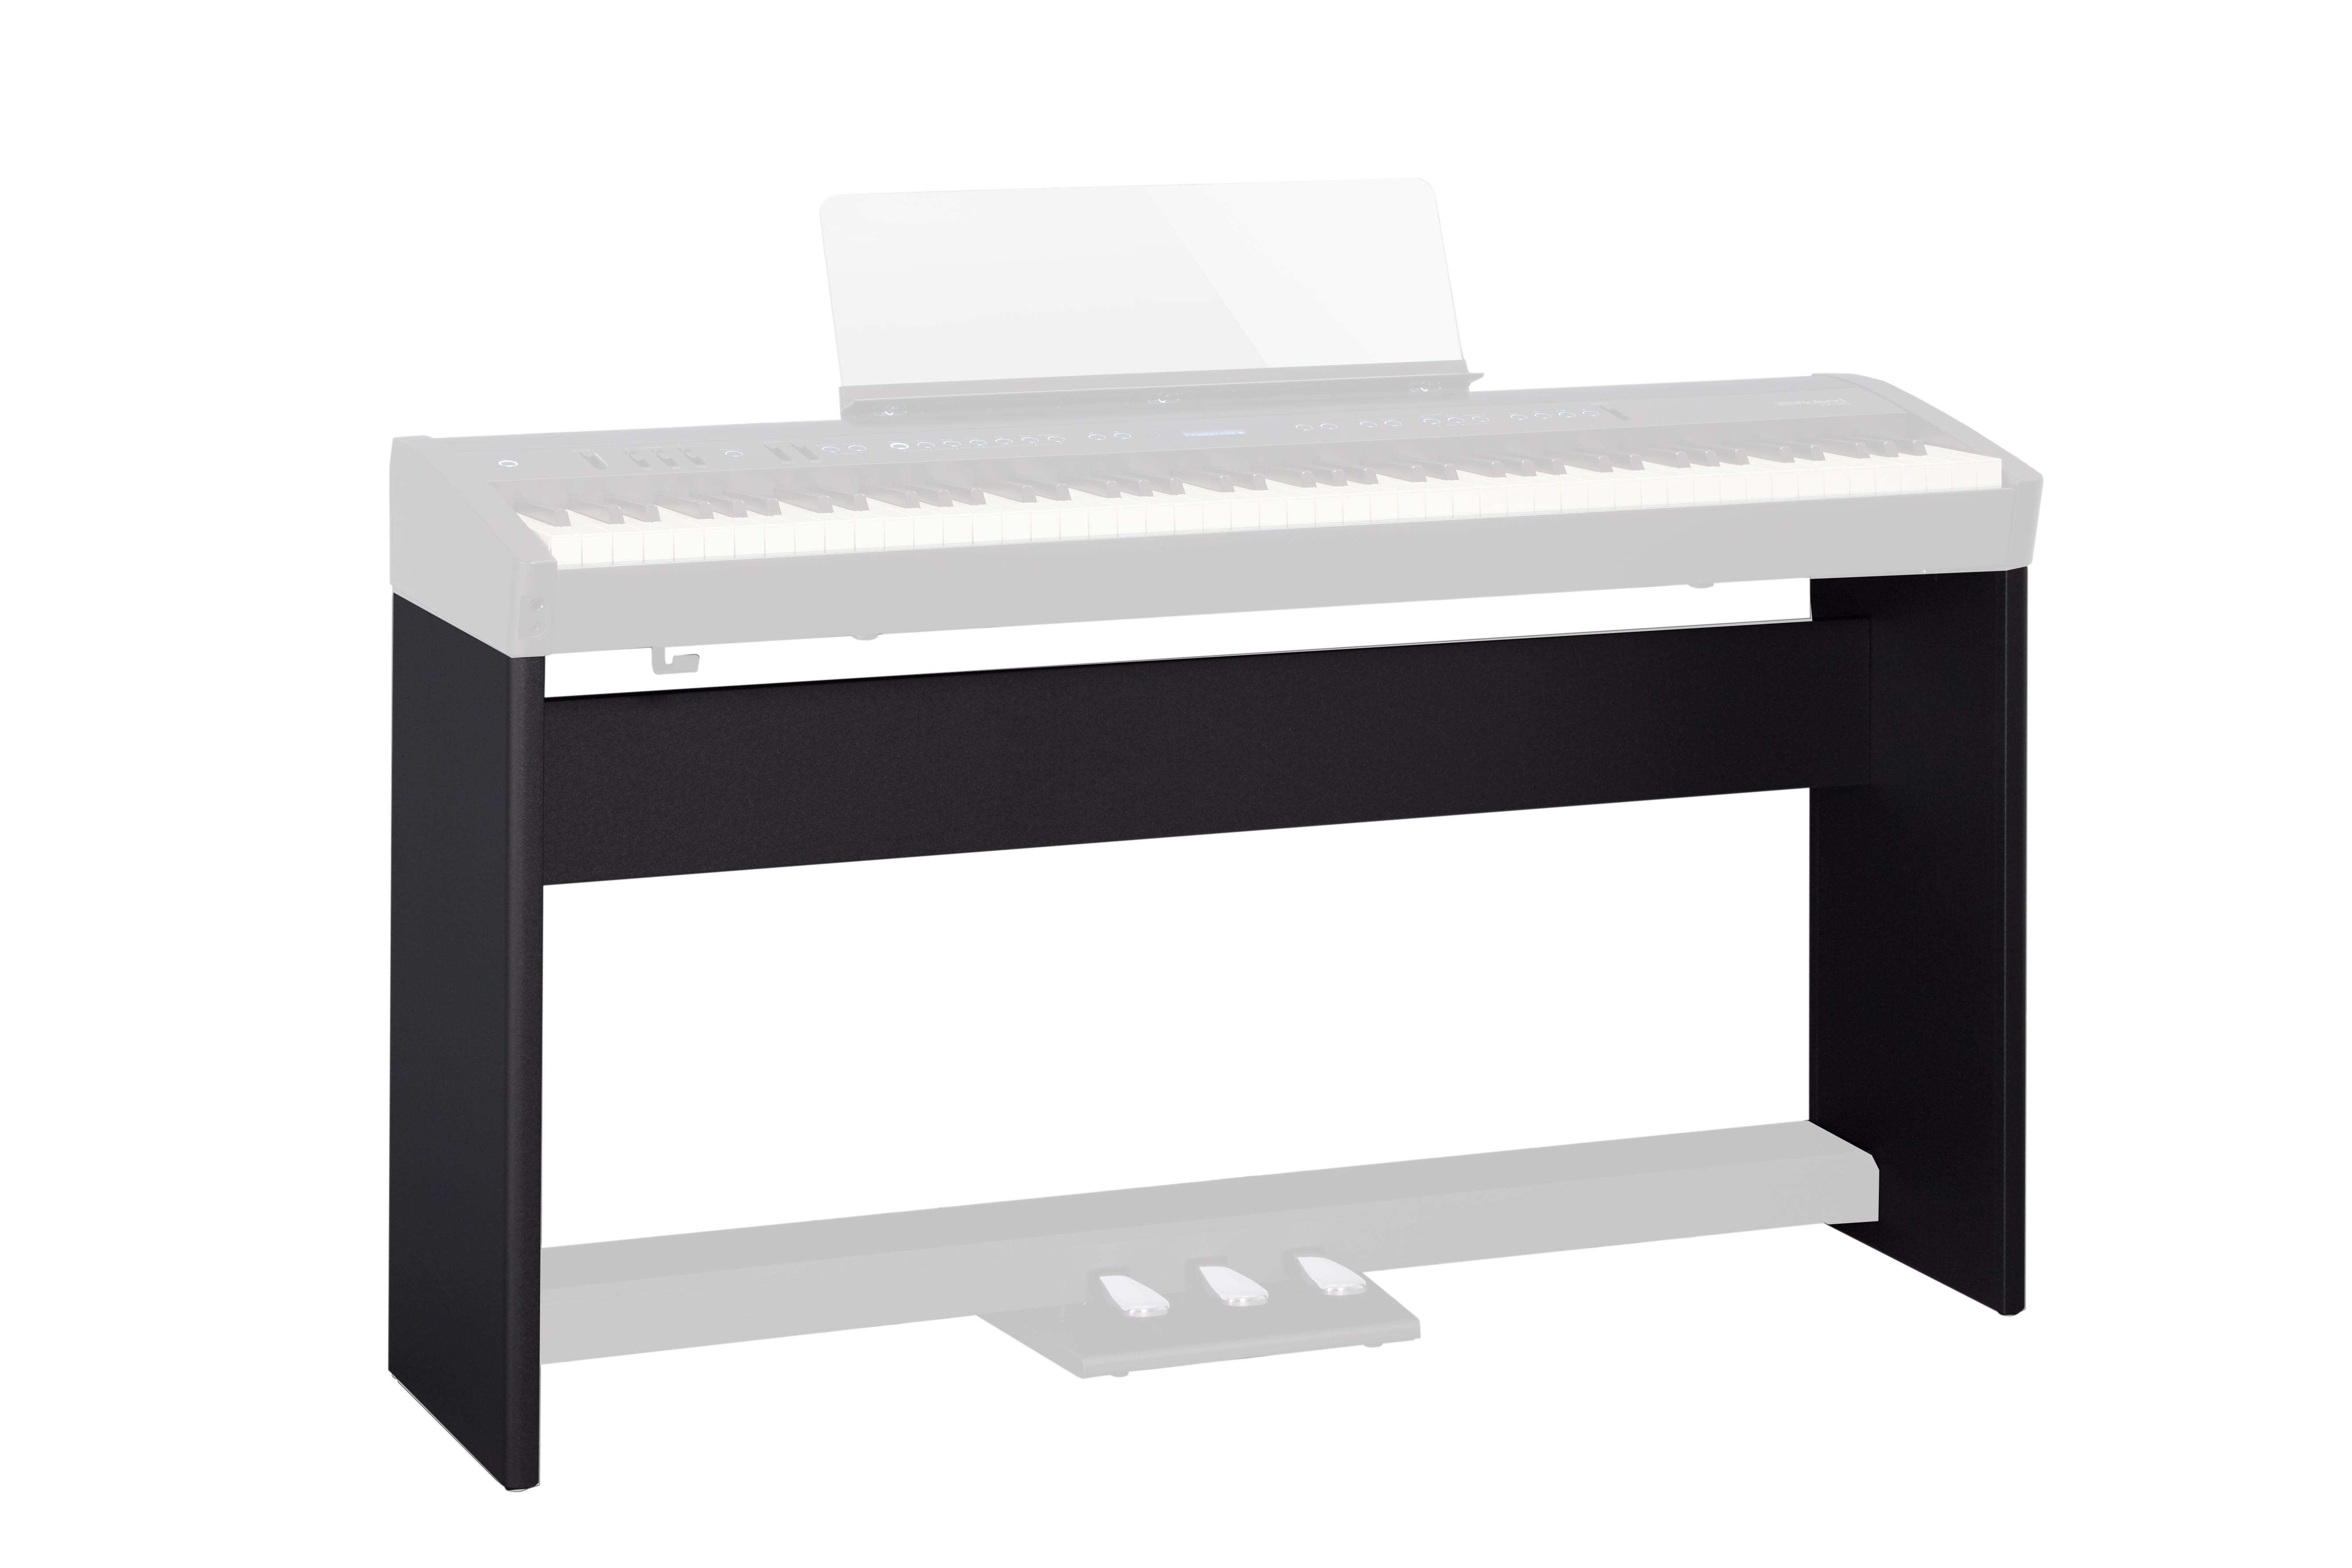 Claviers & Pianos - STANDS - ROLAND - KSC-72-BK - Royez Musik